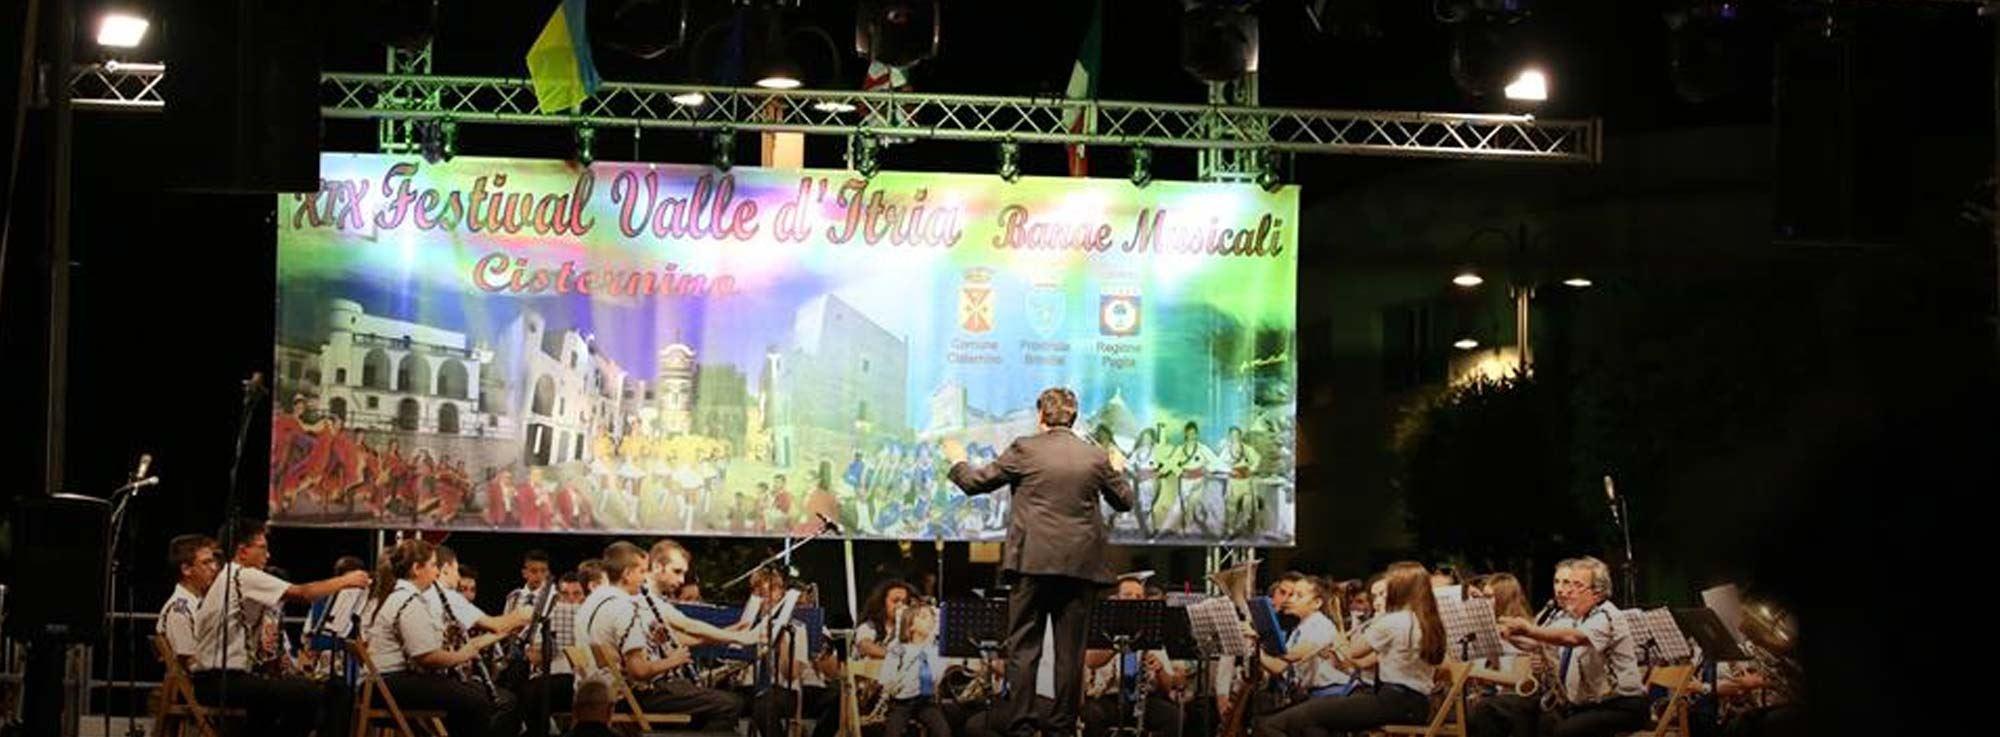 Cisternino: Festival Valle d'Itria